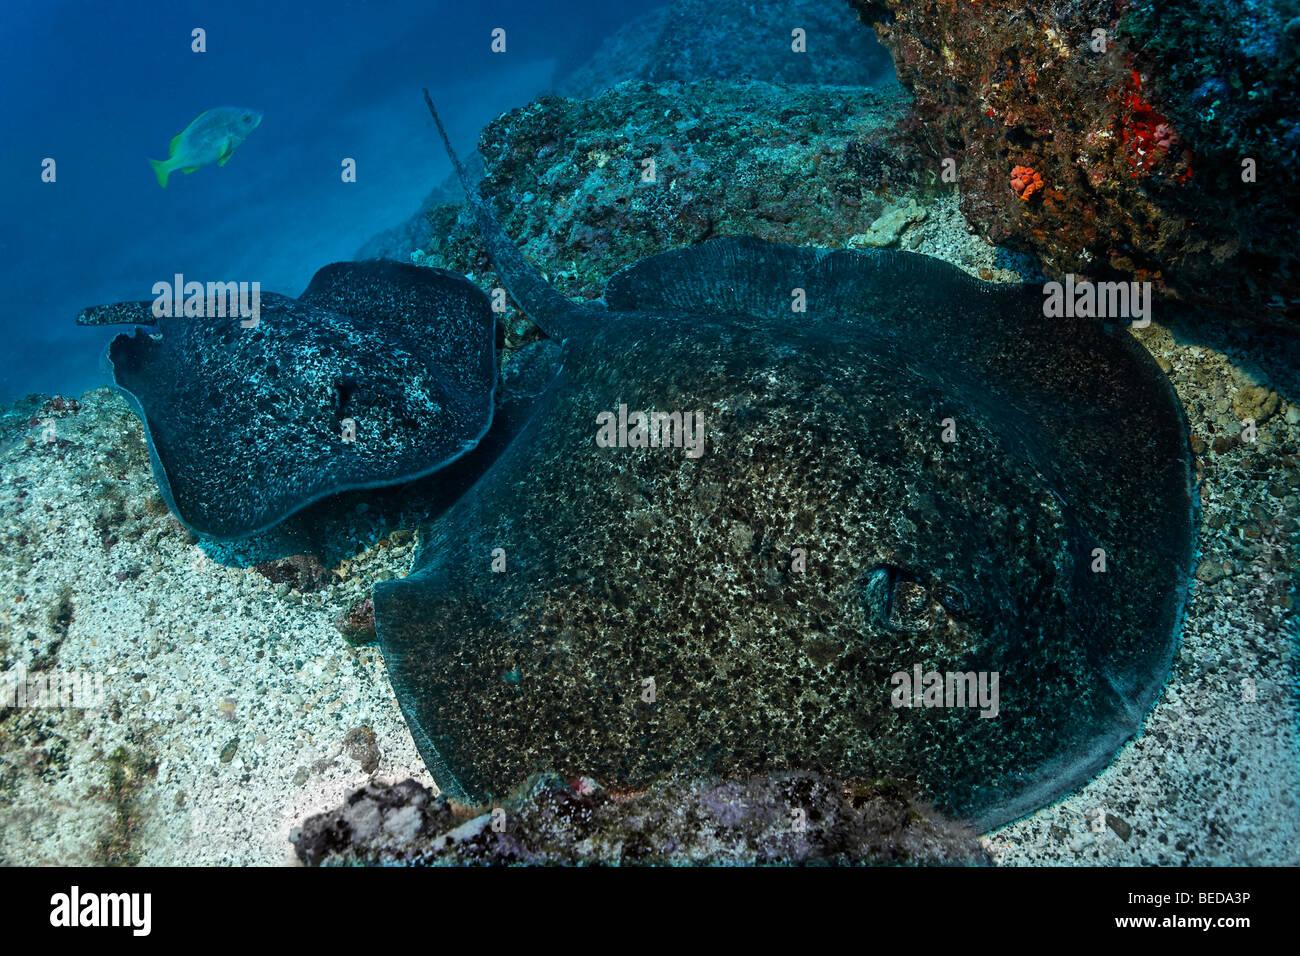 Zwei Blackspotted Stachelrochen (Taeniura Meyeni), ruhen, Riff, Cocos Island, Costa Rica, Mittelamerika, Pazifik Stockbild